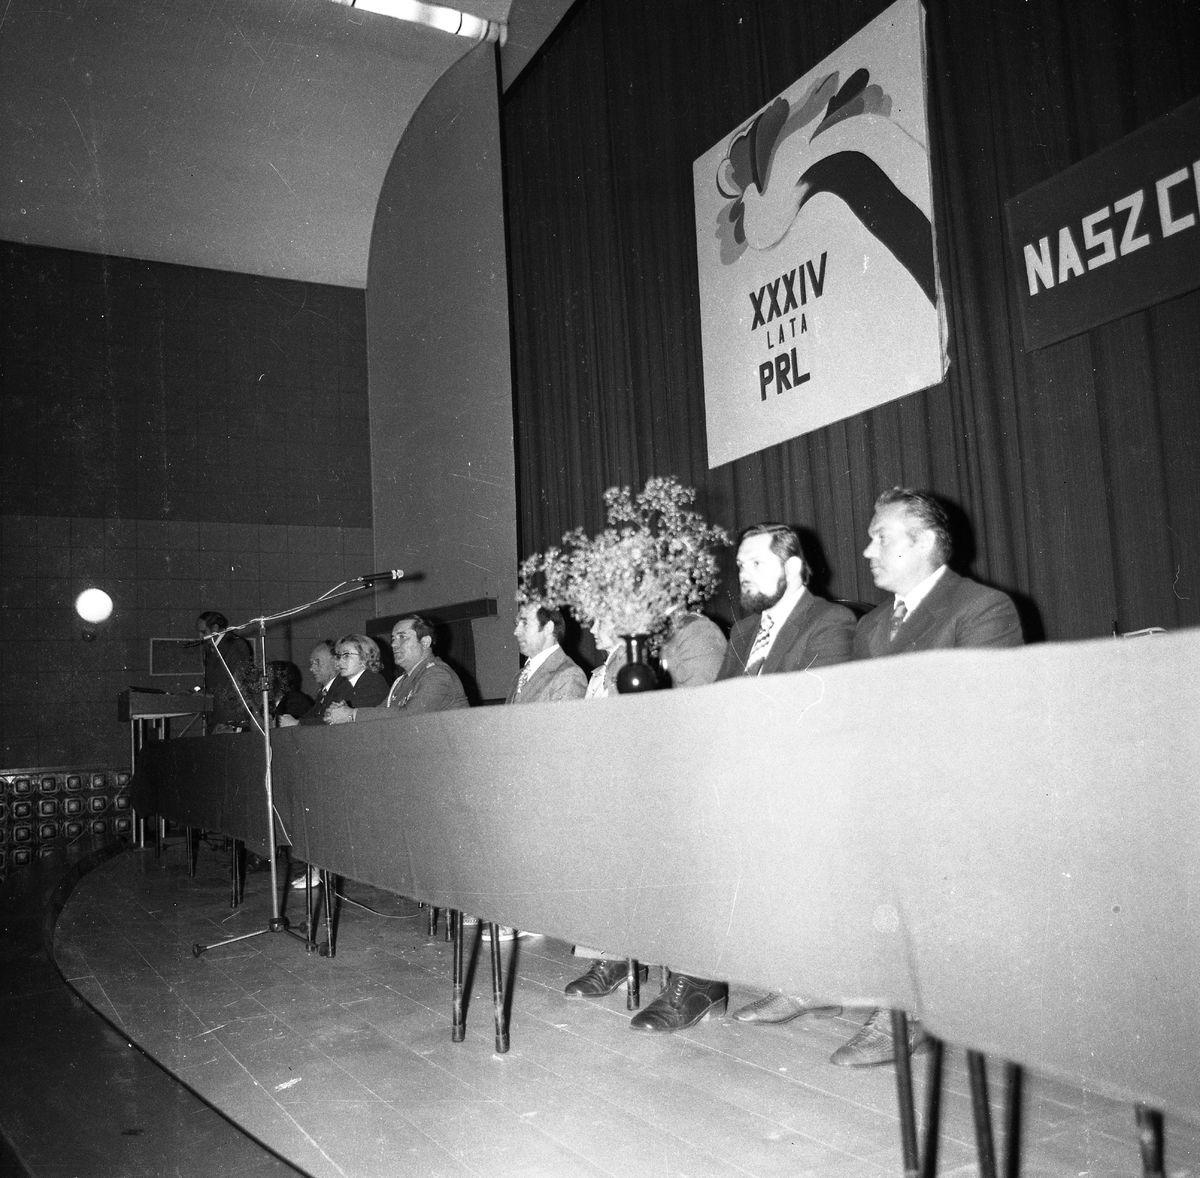 34-lecie PRL, 1978 r.